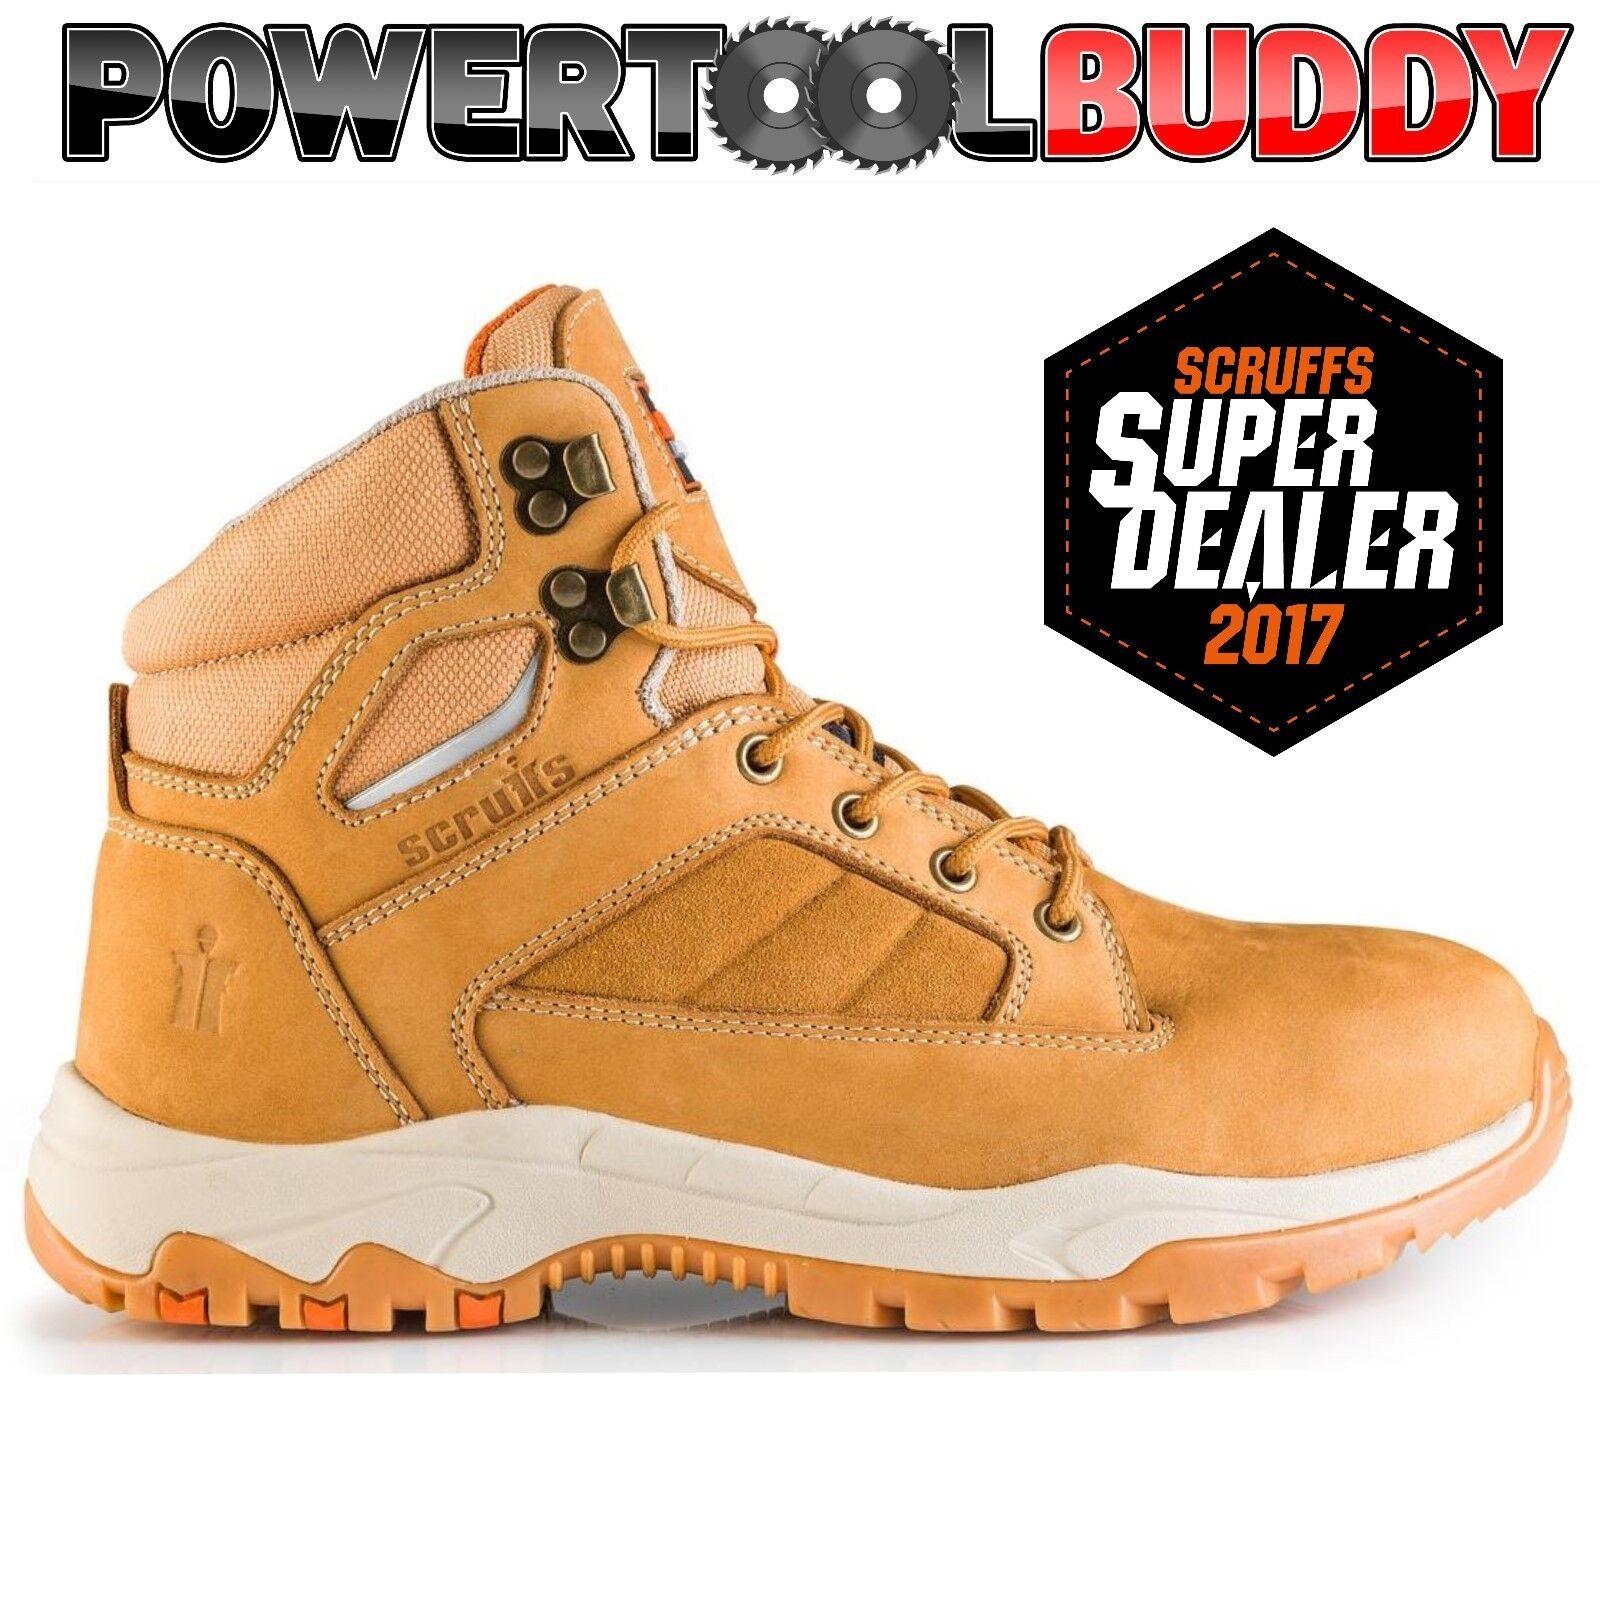 Scruffs OXIDE Safety Boots Tan Sizes 7-12 Mens Steel Toe Cap Work Boot Hiker B5